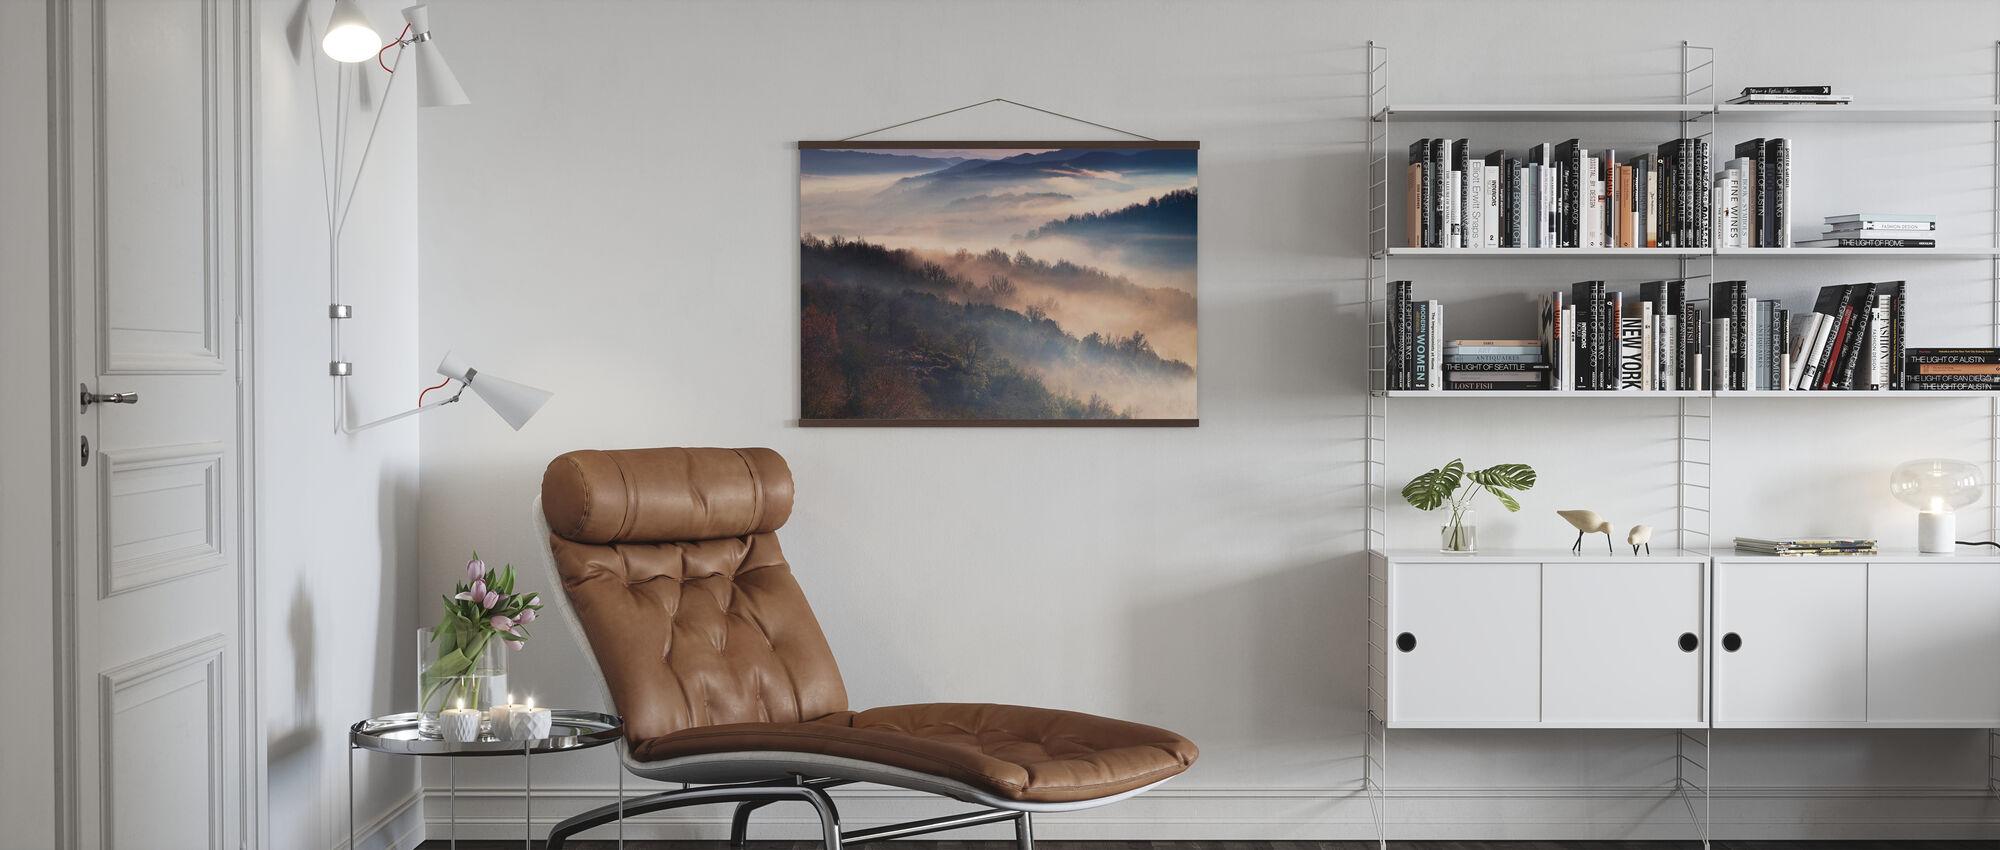 Mistige bergen - Poster - Woonkamer